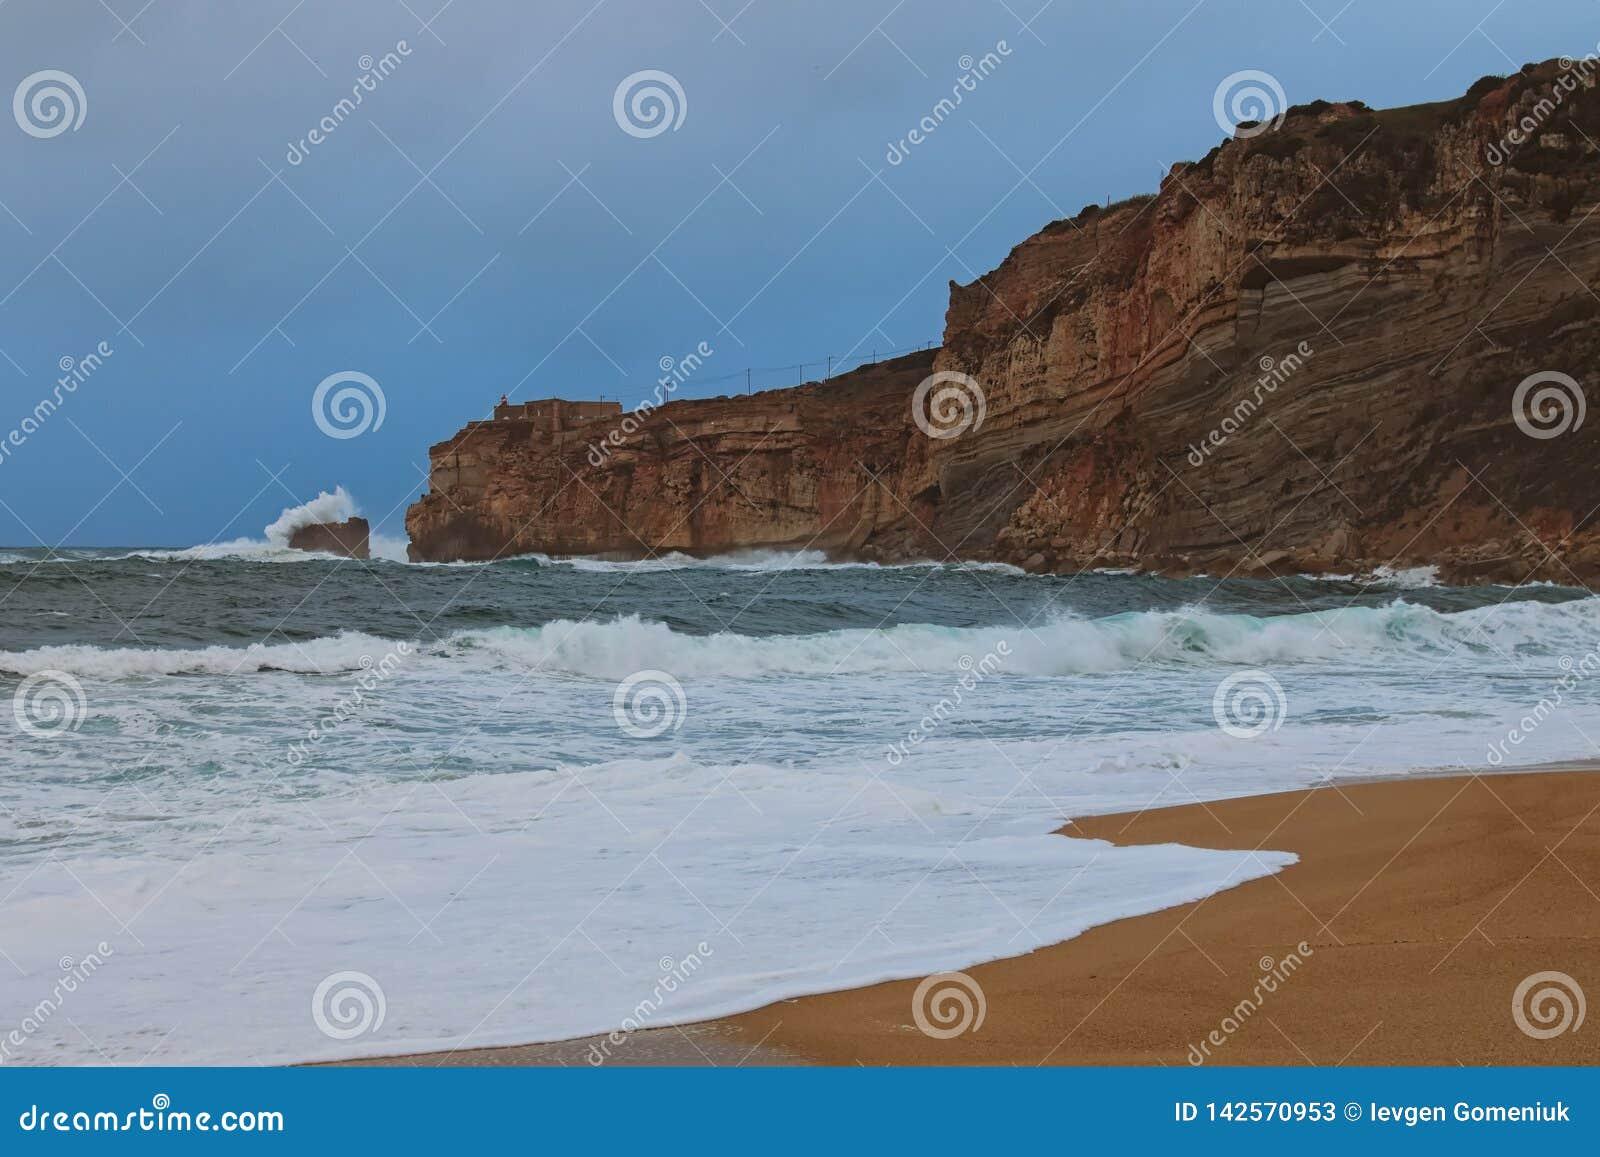 Amazing landscape view of stormy Atlantic ocean near famous touristic city Nazare. Big wave breaks about picturesque cliff